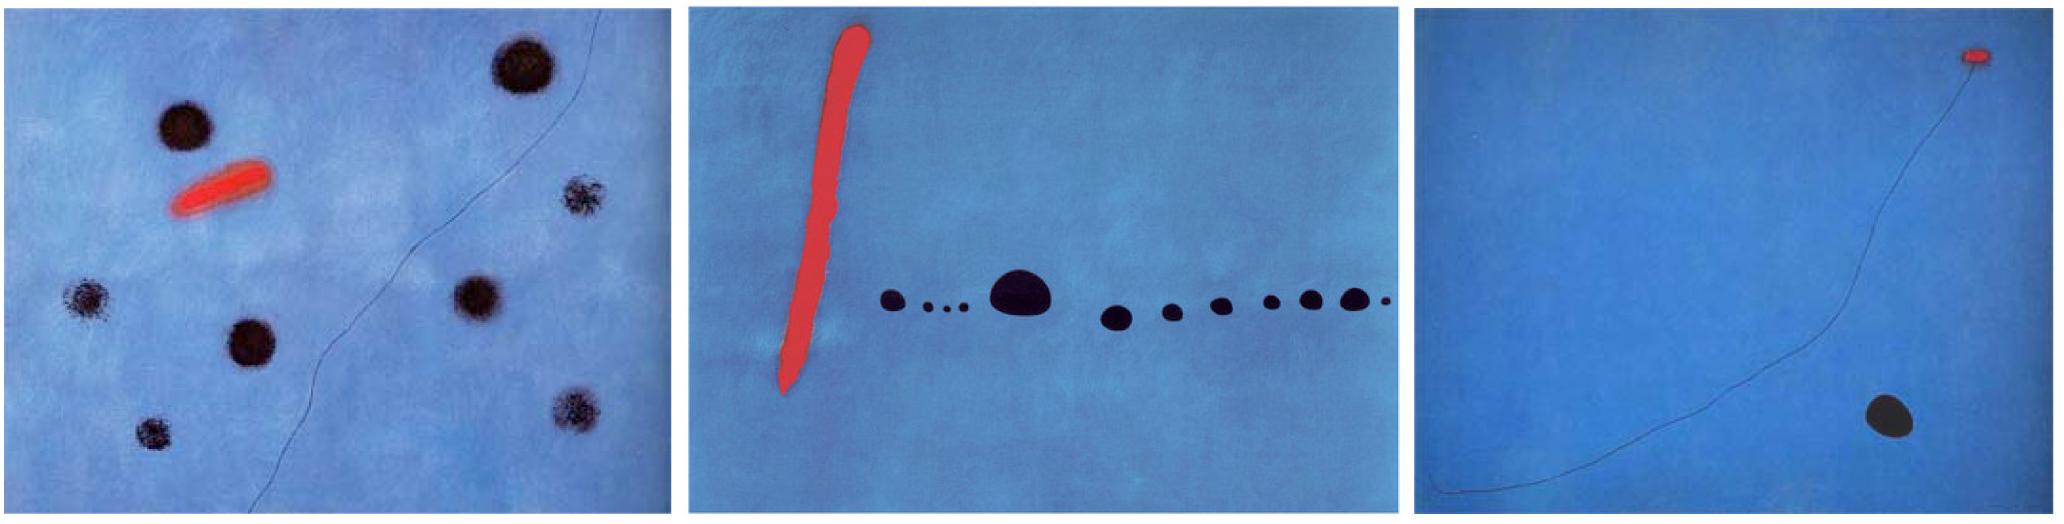 Joan Miro. (1961). Bleu I, II, III. Retrieved from The Pompidou.